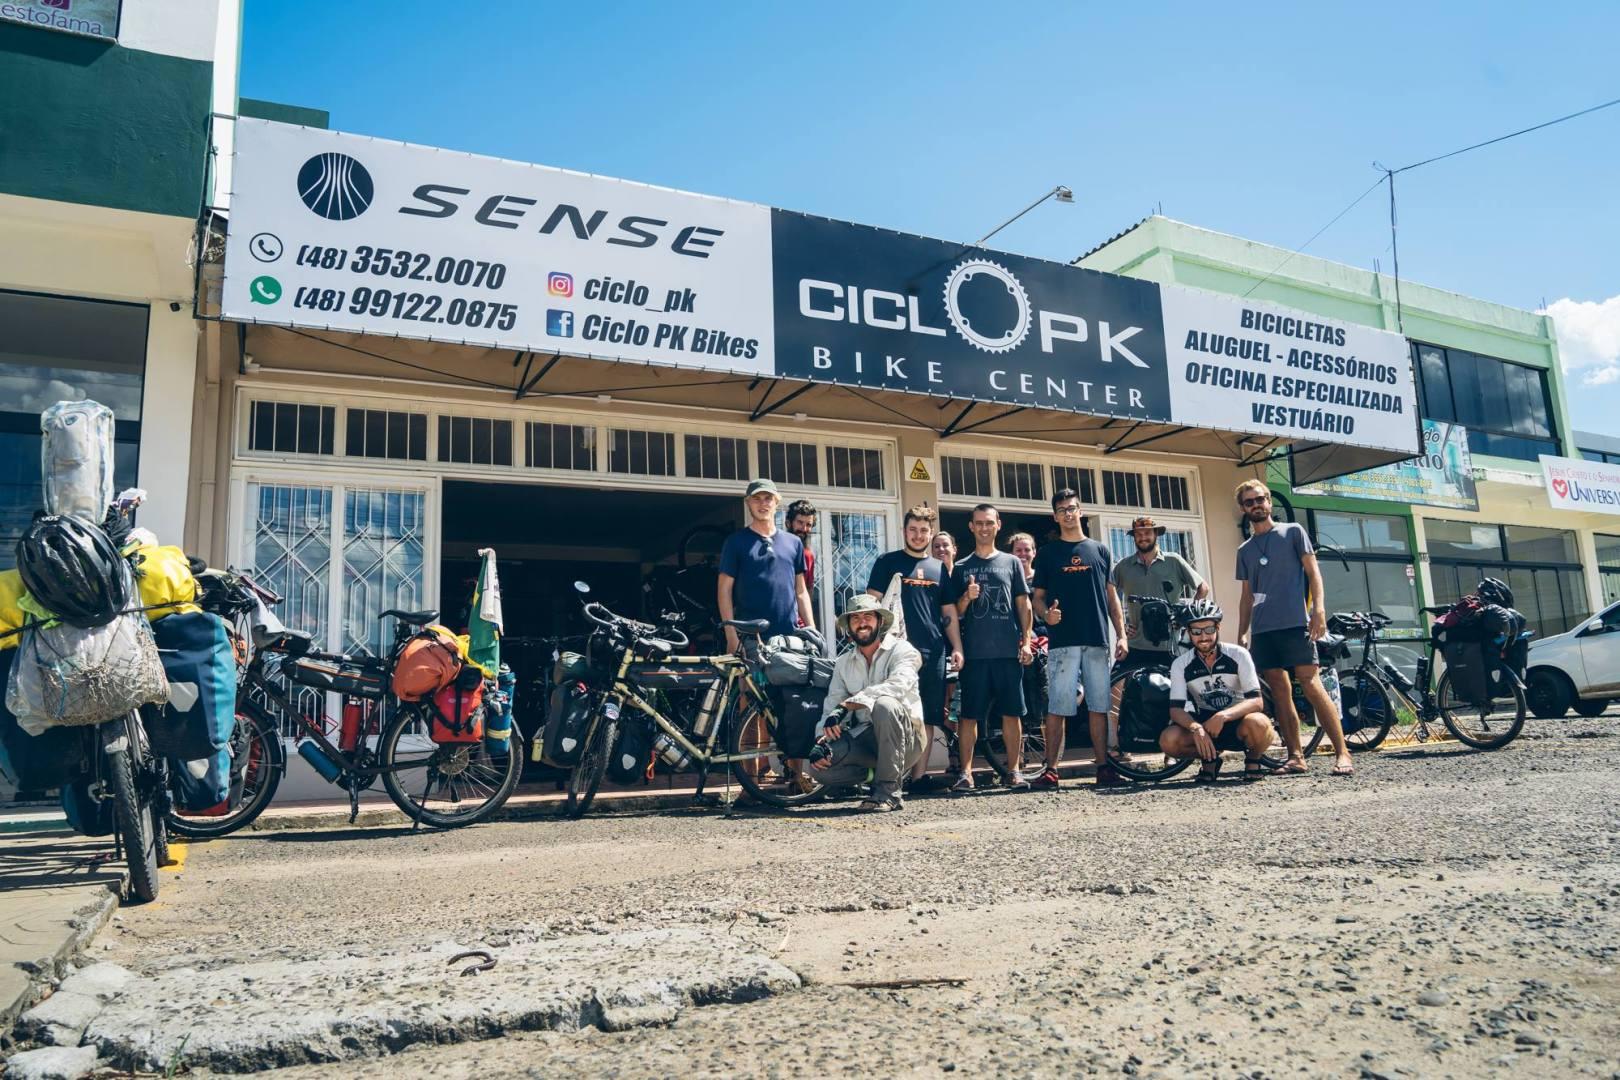 Ciclo PK un magasin qui a pu nous aider